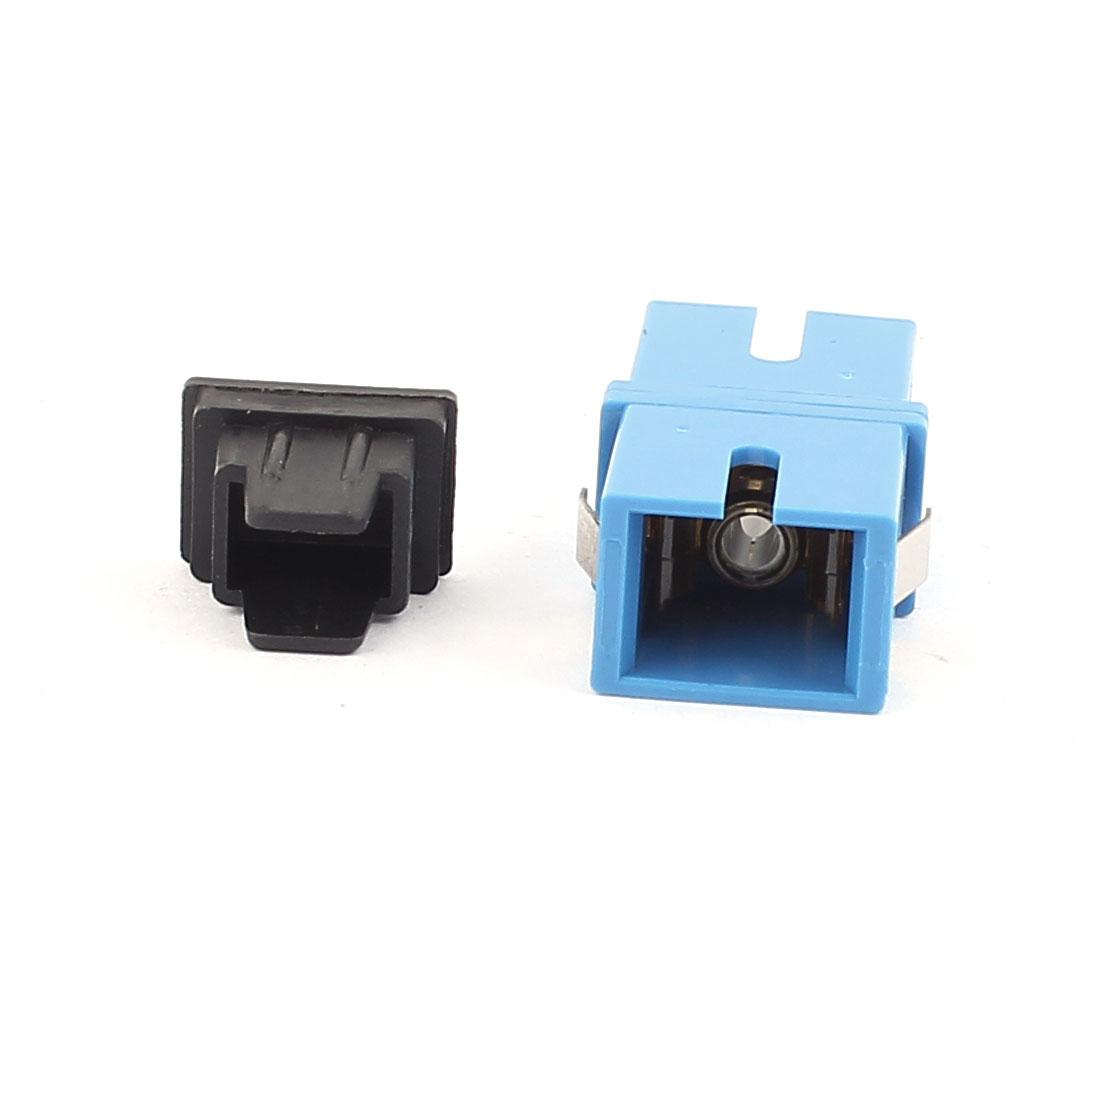 Multi-mode SC-SC UPC Simplex Fibre Coupler Flange Adapter Optical Fiber Connector